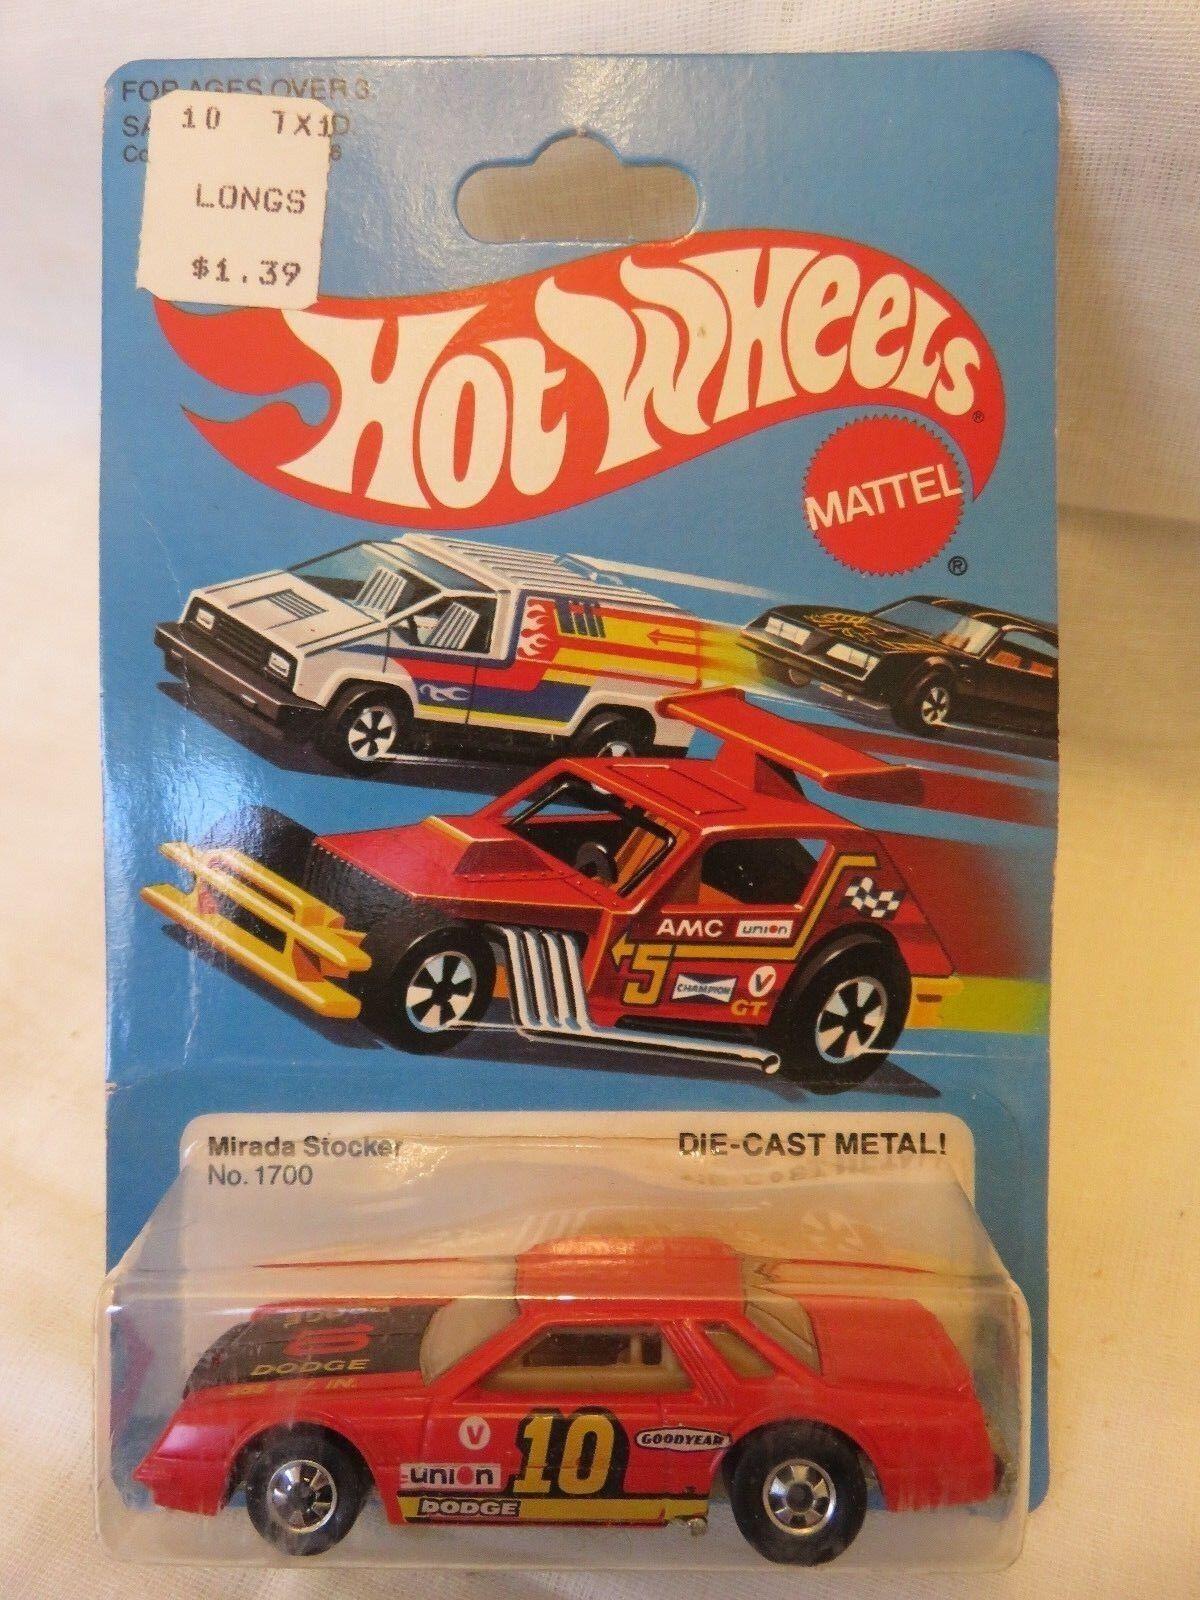 protección post-venta 1981 Vintage Hot Hot Hot Wheels mirada Stocker  10 Rojo 1700 Hong Kong B De Metal Fundido a Troquel  Venta barata